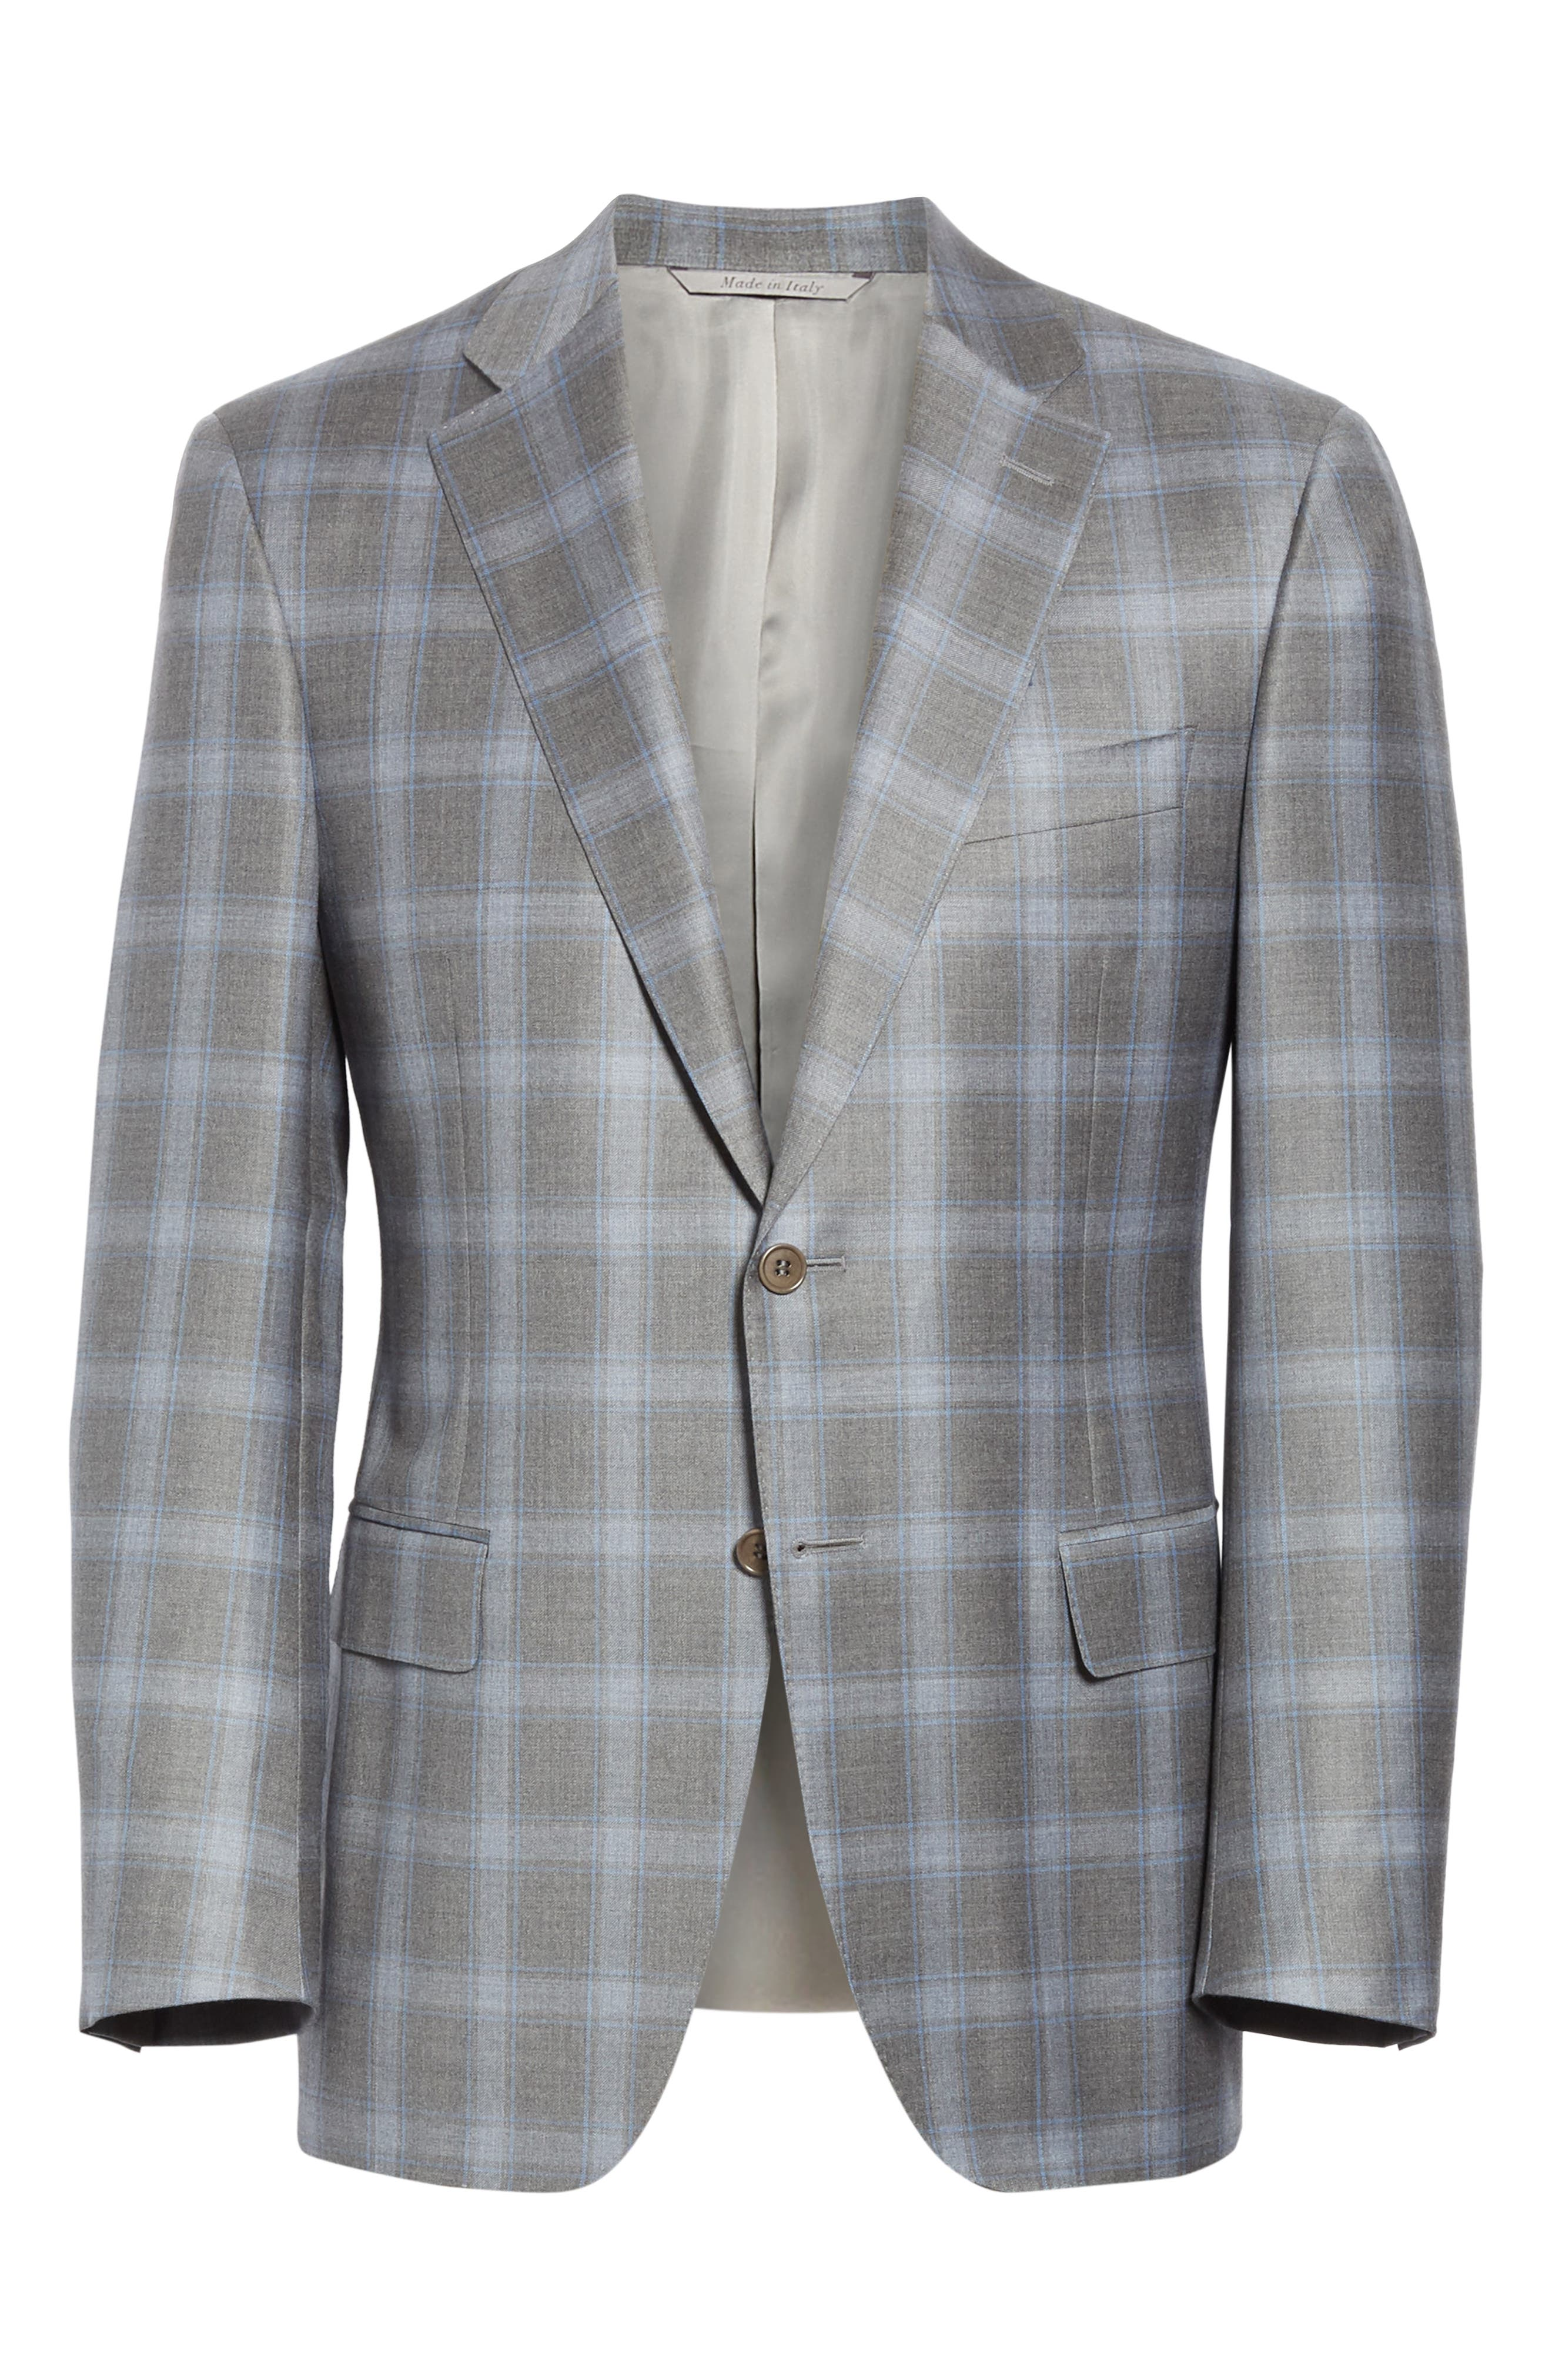 Sienna Classic Fit Plaid Wool Sport Coat,                             Alternate thumbnail 5, color,                             GREY